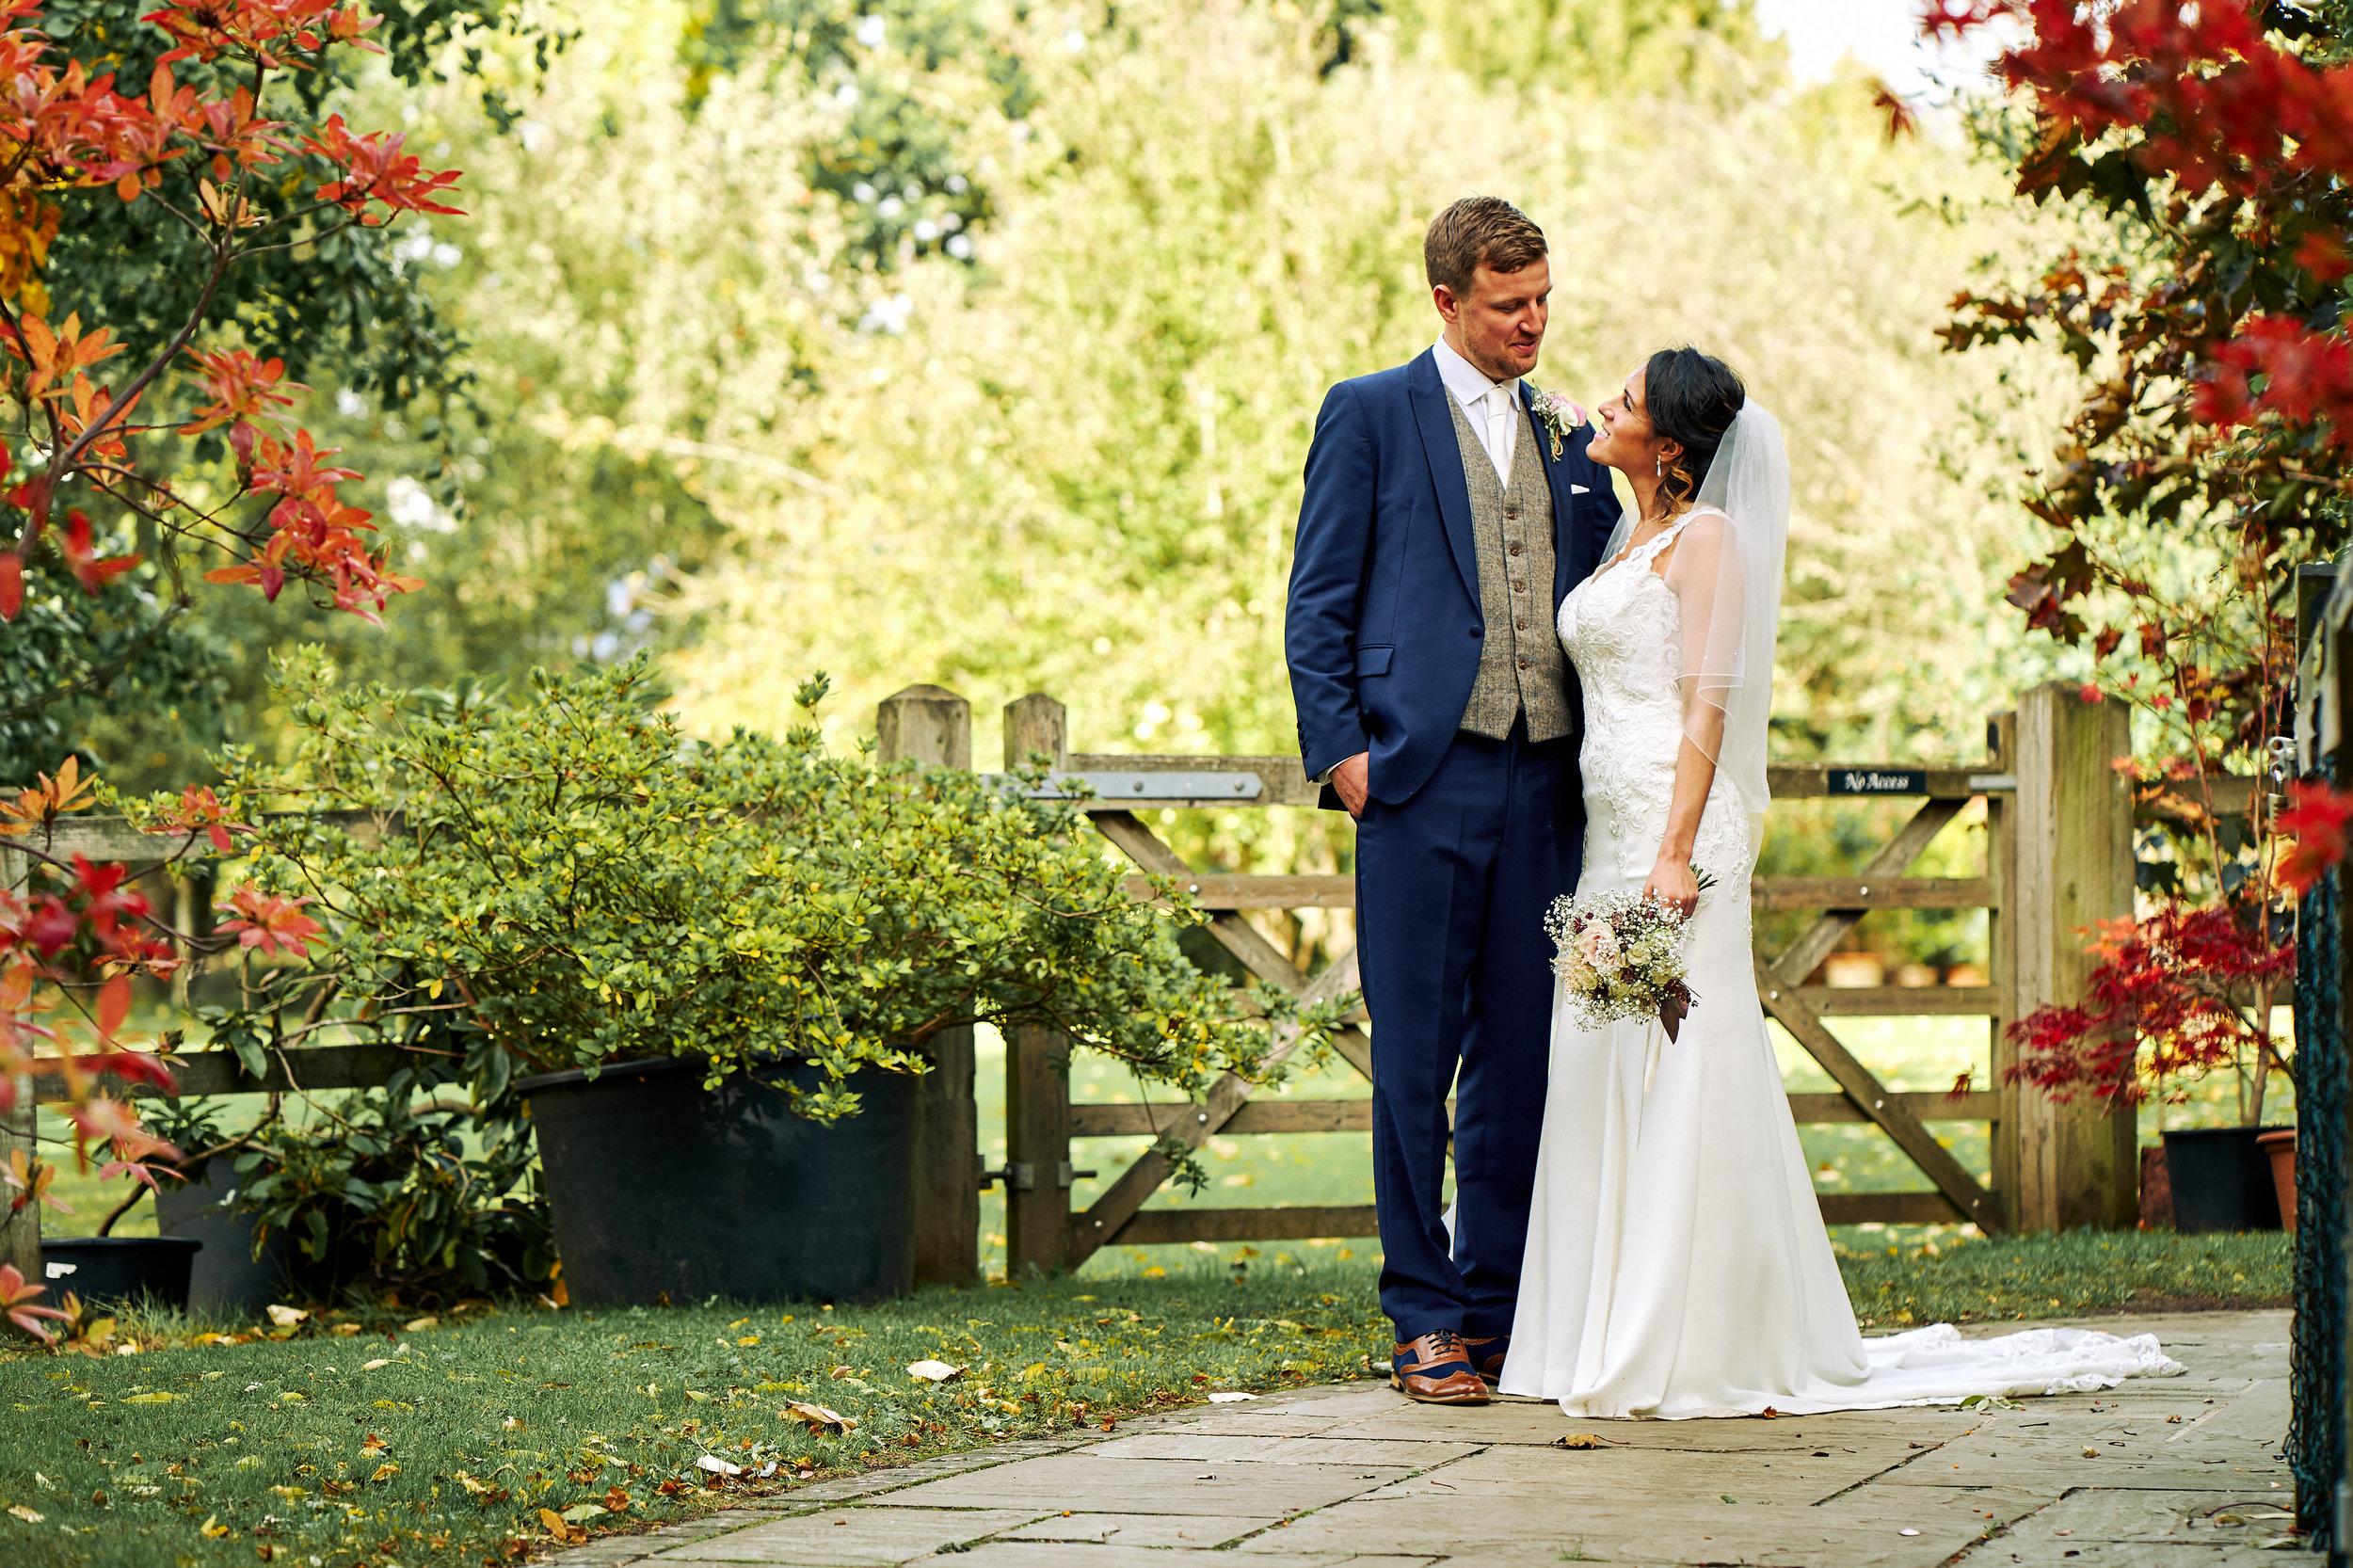 Carolina Nicholas Wedding Rivervale Barn at Rivervale Barn Yateley on 12 October 2018.